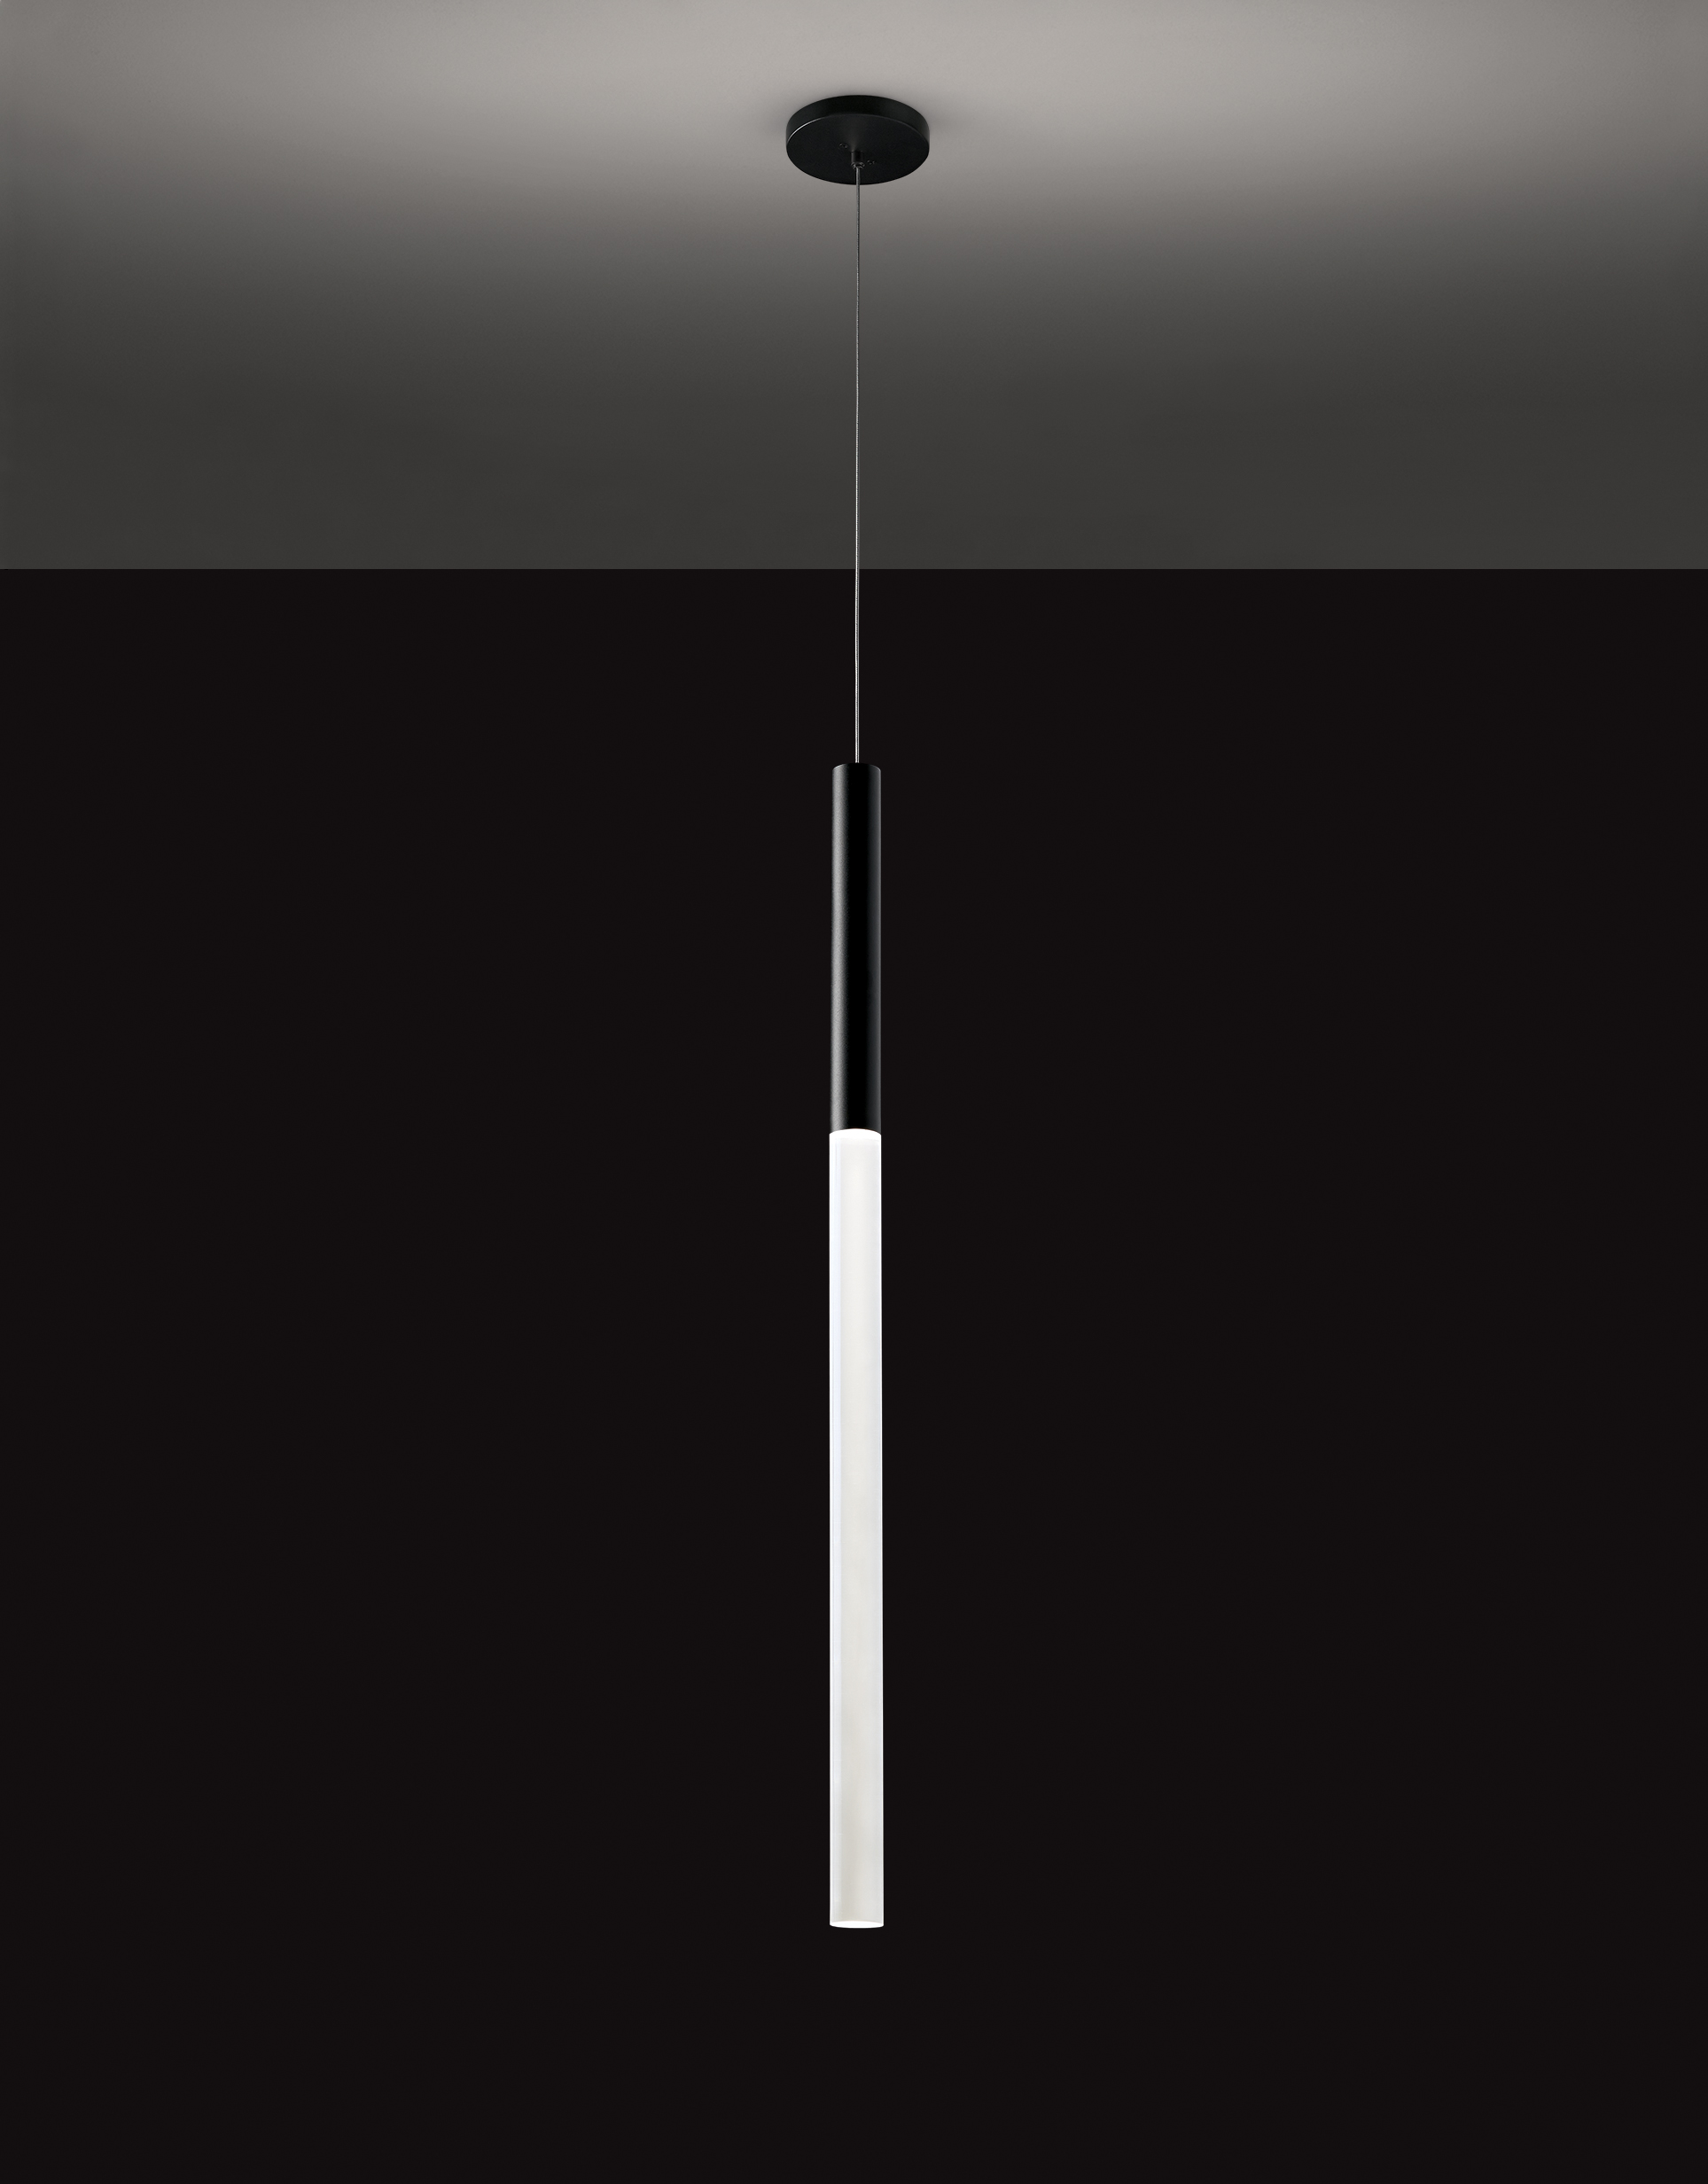 GlowStick Pendant  OCL Architectural Lighting